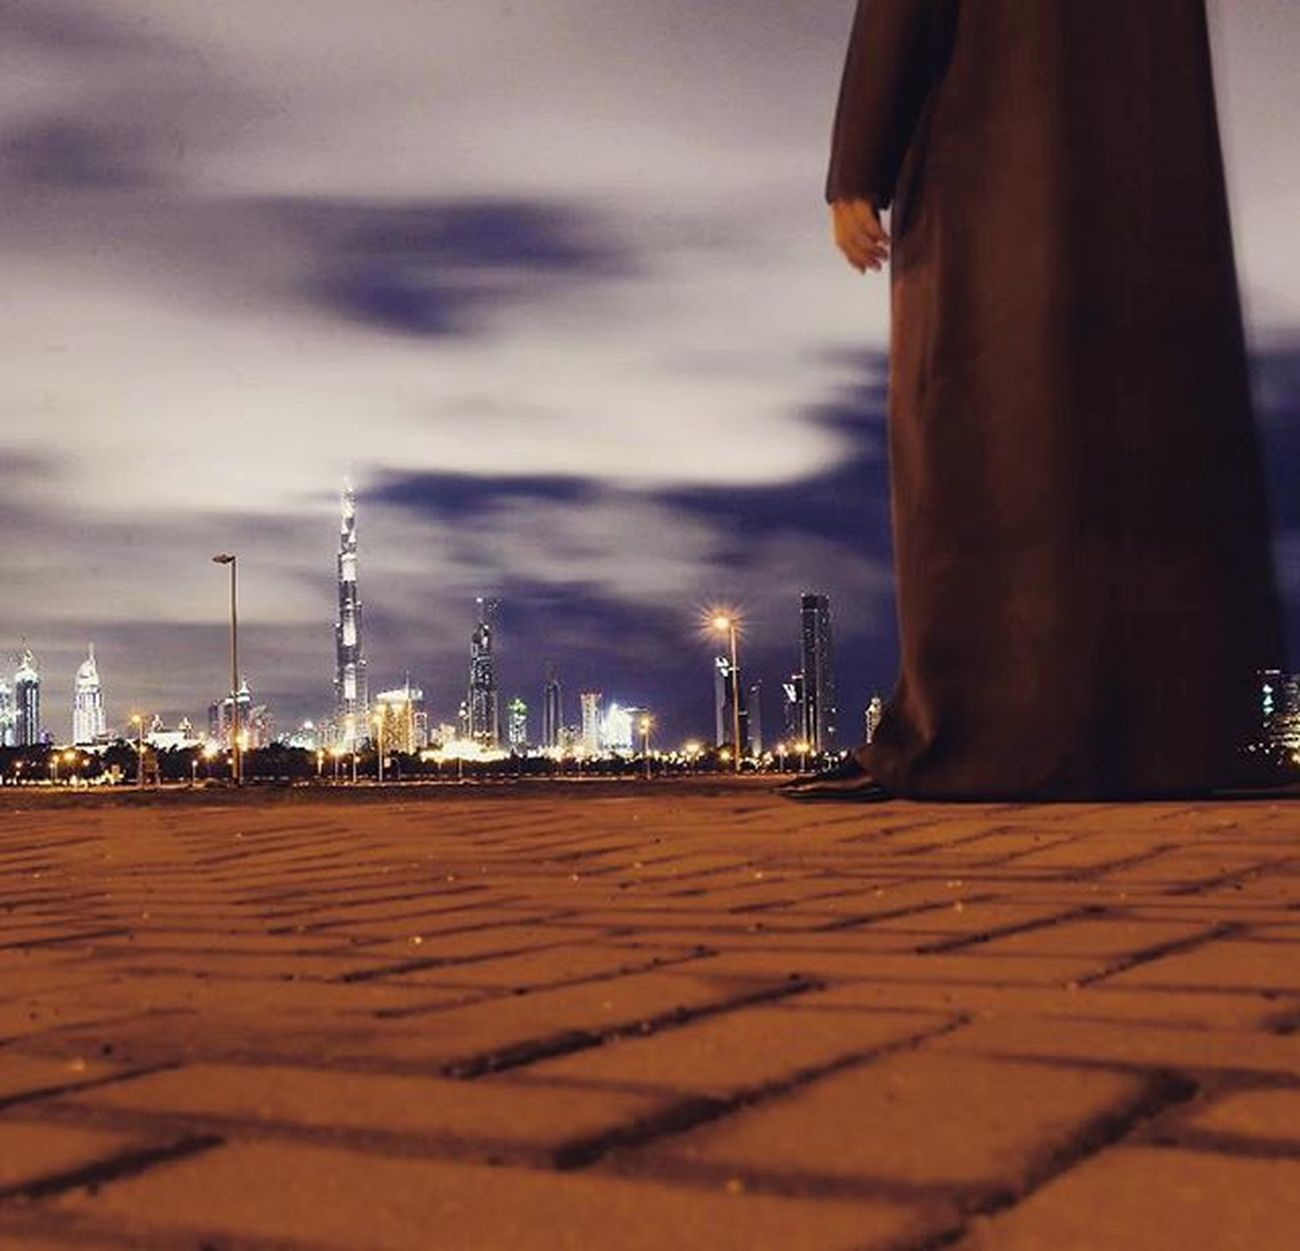 My Dubai 🇦🇪 By:Mustafa Alamiri ➖➖➖➖ Mydxb Dubai Mydubai DXB UAE Mydxb1_ Unitedarabemirates Sharjah Ajman Lovedubai Followme Fujairah Love Dubailife Abudhabi Instadubai Emirates Alain Alamiri2012 Follow Dubaitag ❤ Ummalquwain Selfie Rak rasalkhaimah myuae meenabazaar Powered by @alamiri2012